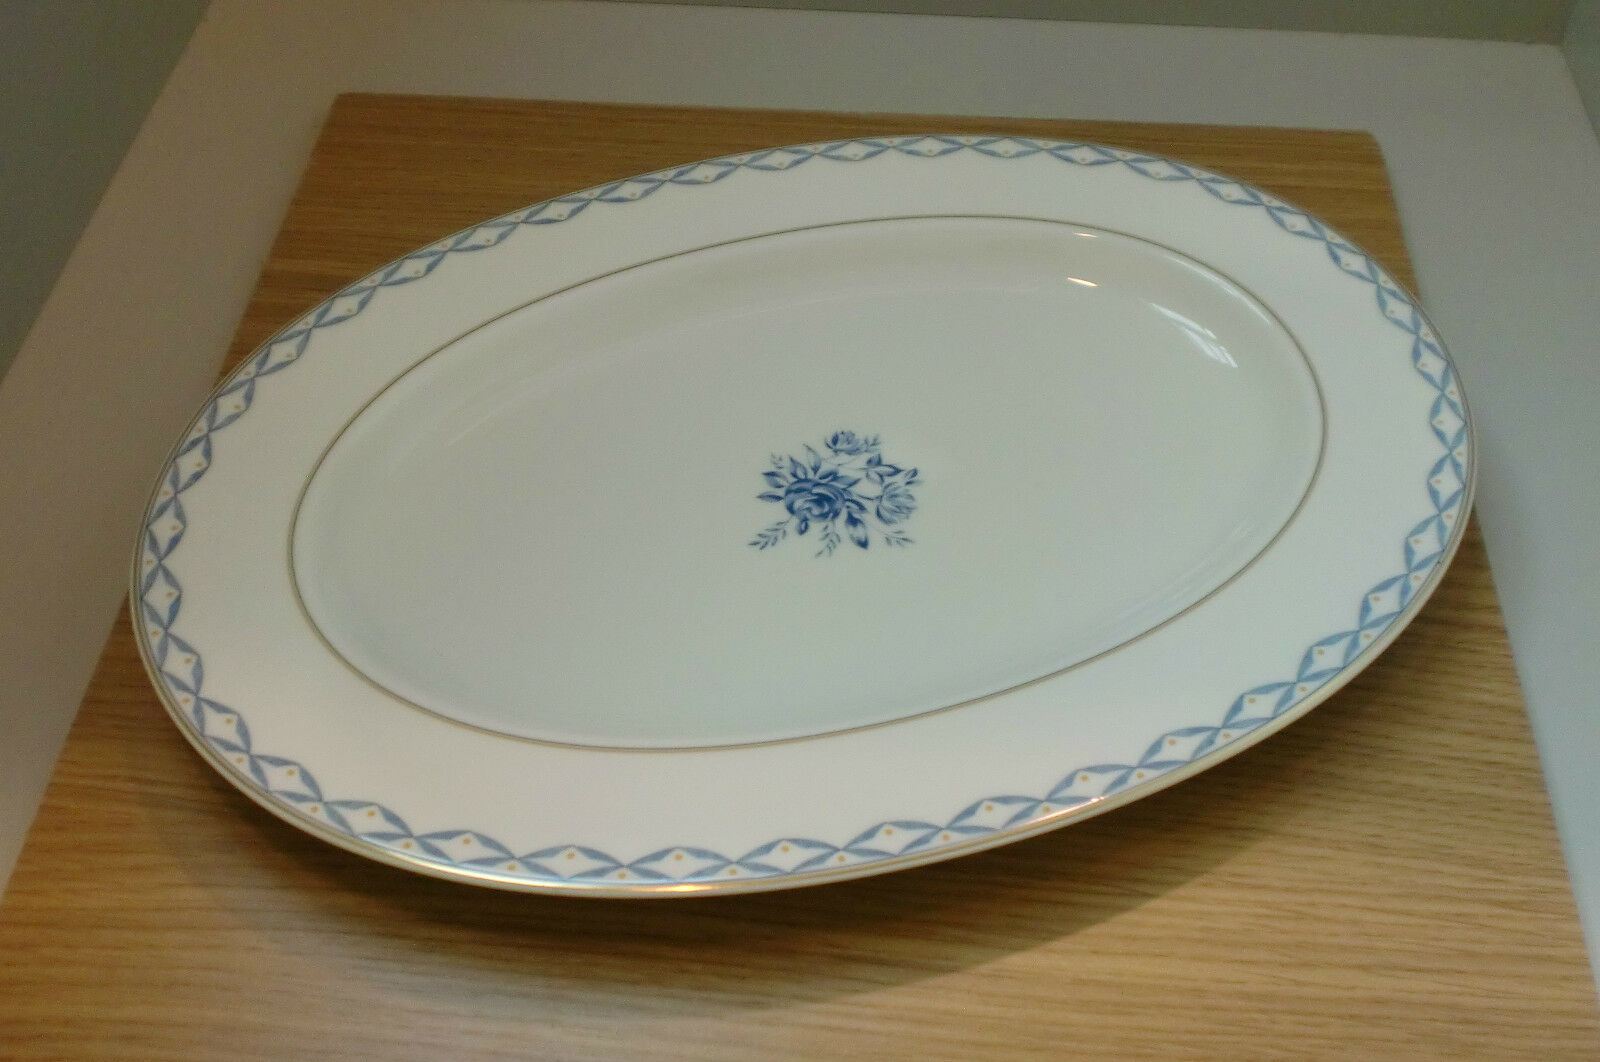 Hutschenreuther Hutschenreuther Hutschenreuther Blau Romance Platte oval 39 cm acd448